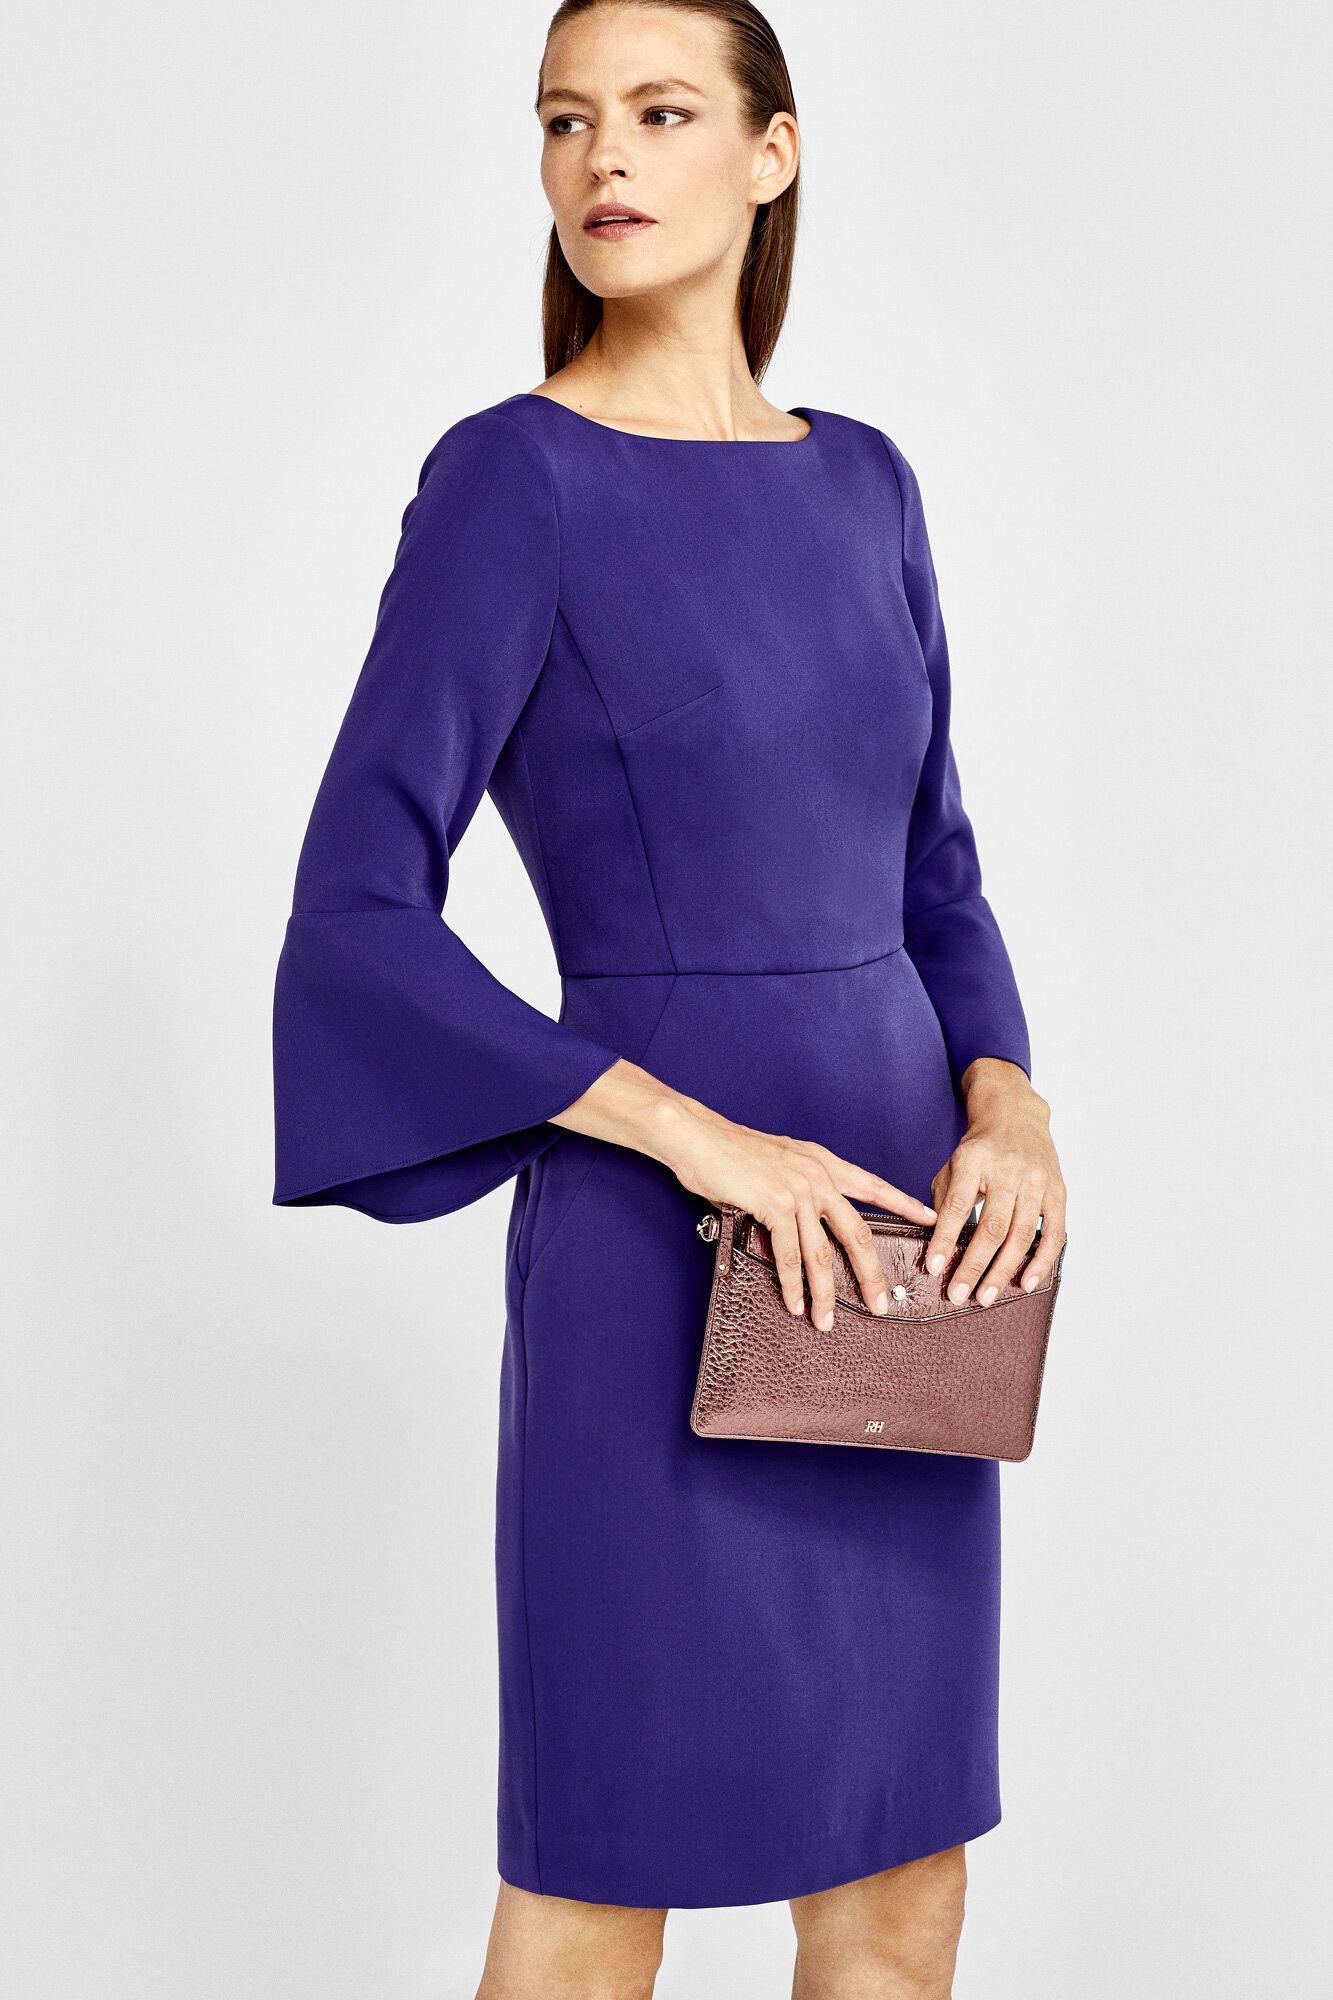 Mi muрів±eca vestida de azul